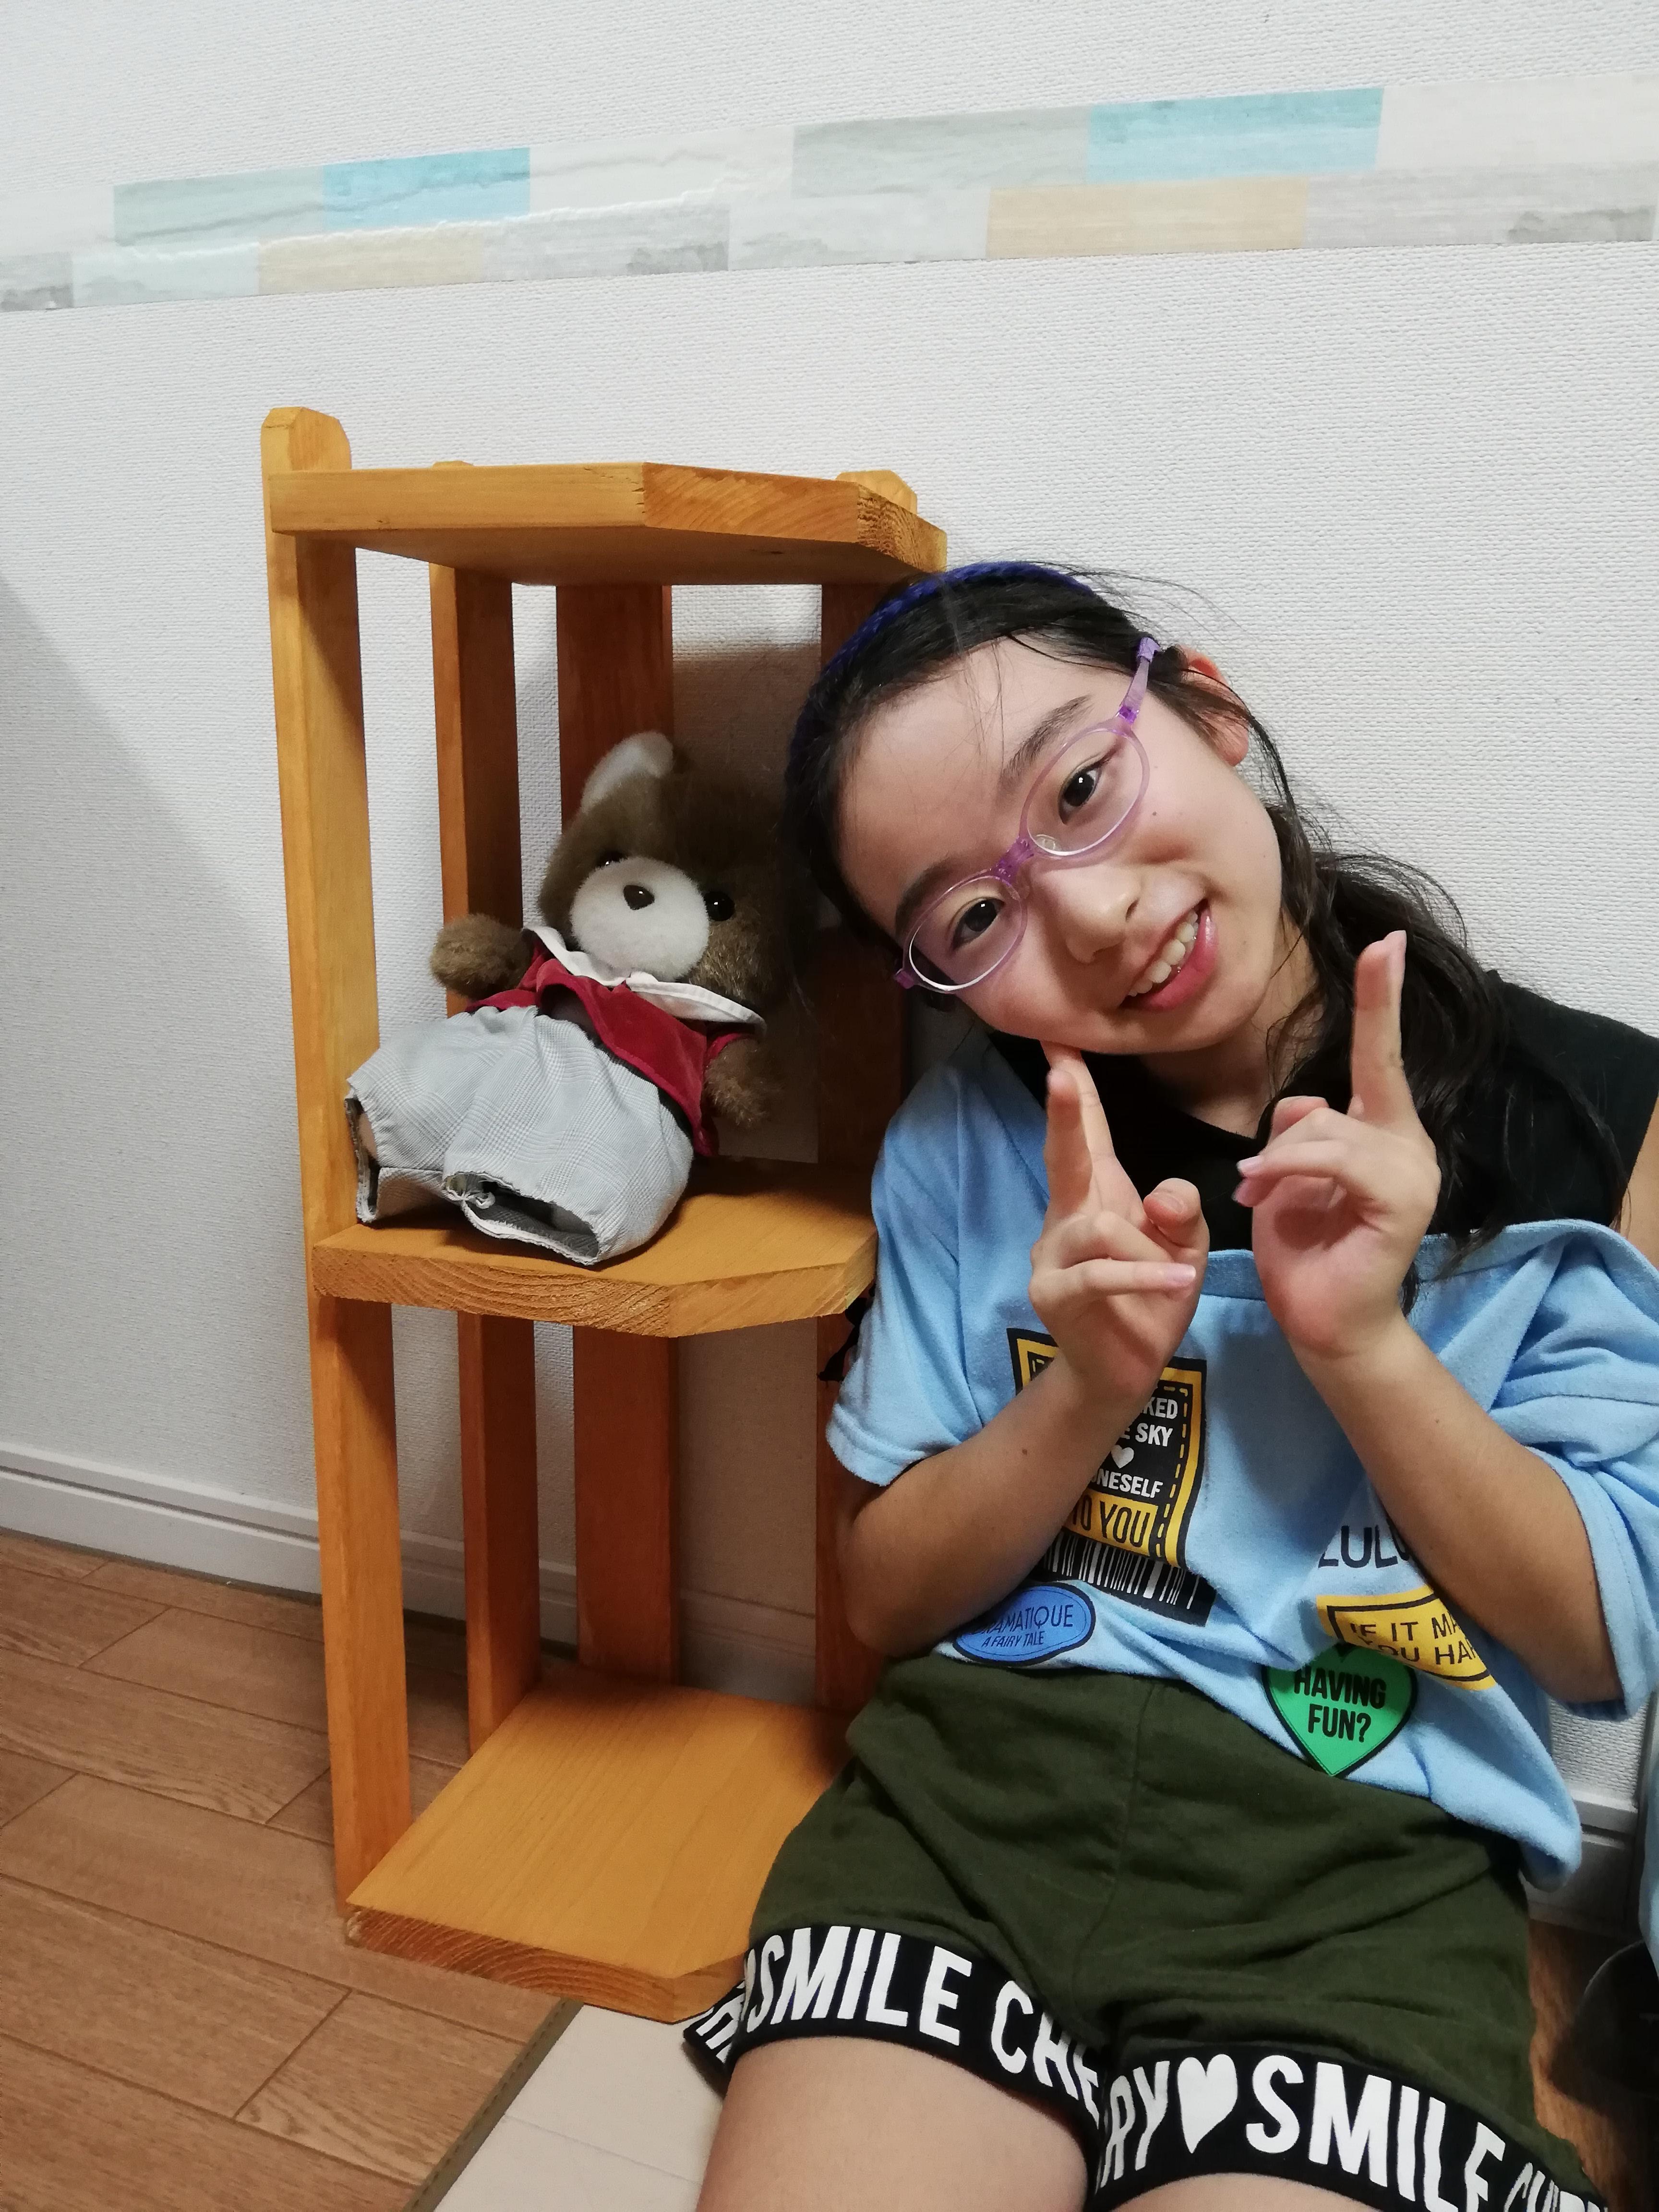 https://www.lixil-reformshop.jp/shop/SP00000113/photos/ec09ab00158cc7c5f80b38f5d477255bf9be5889.jpg